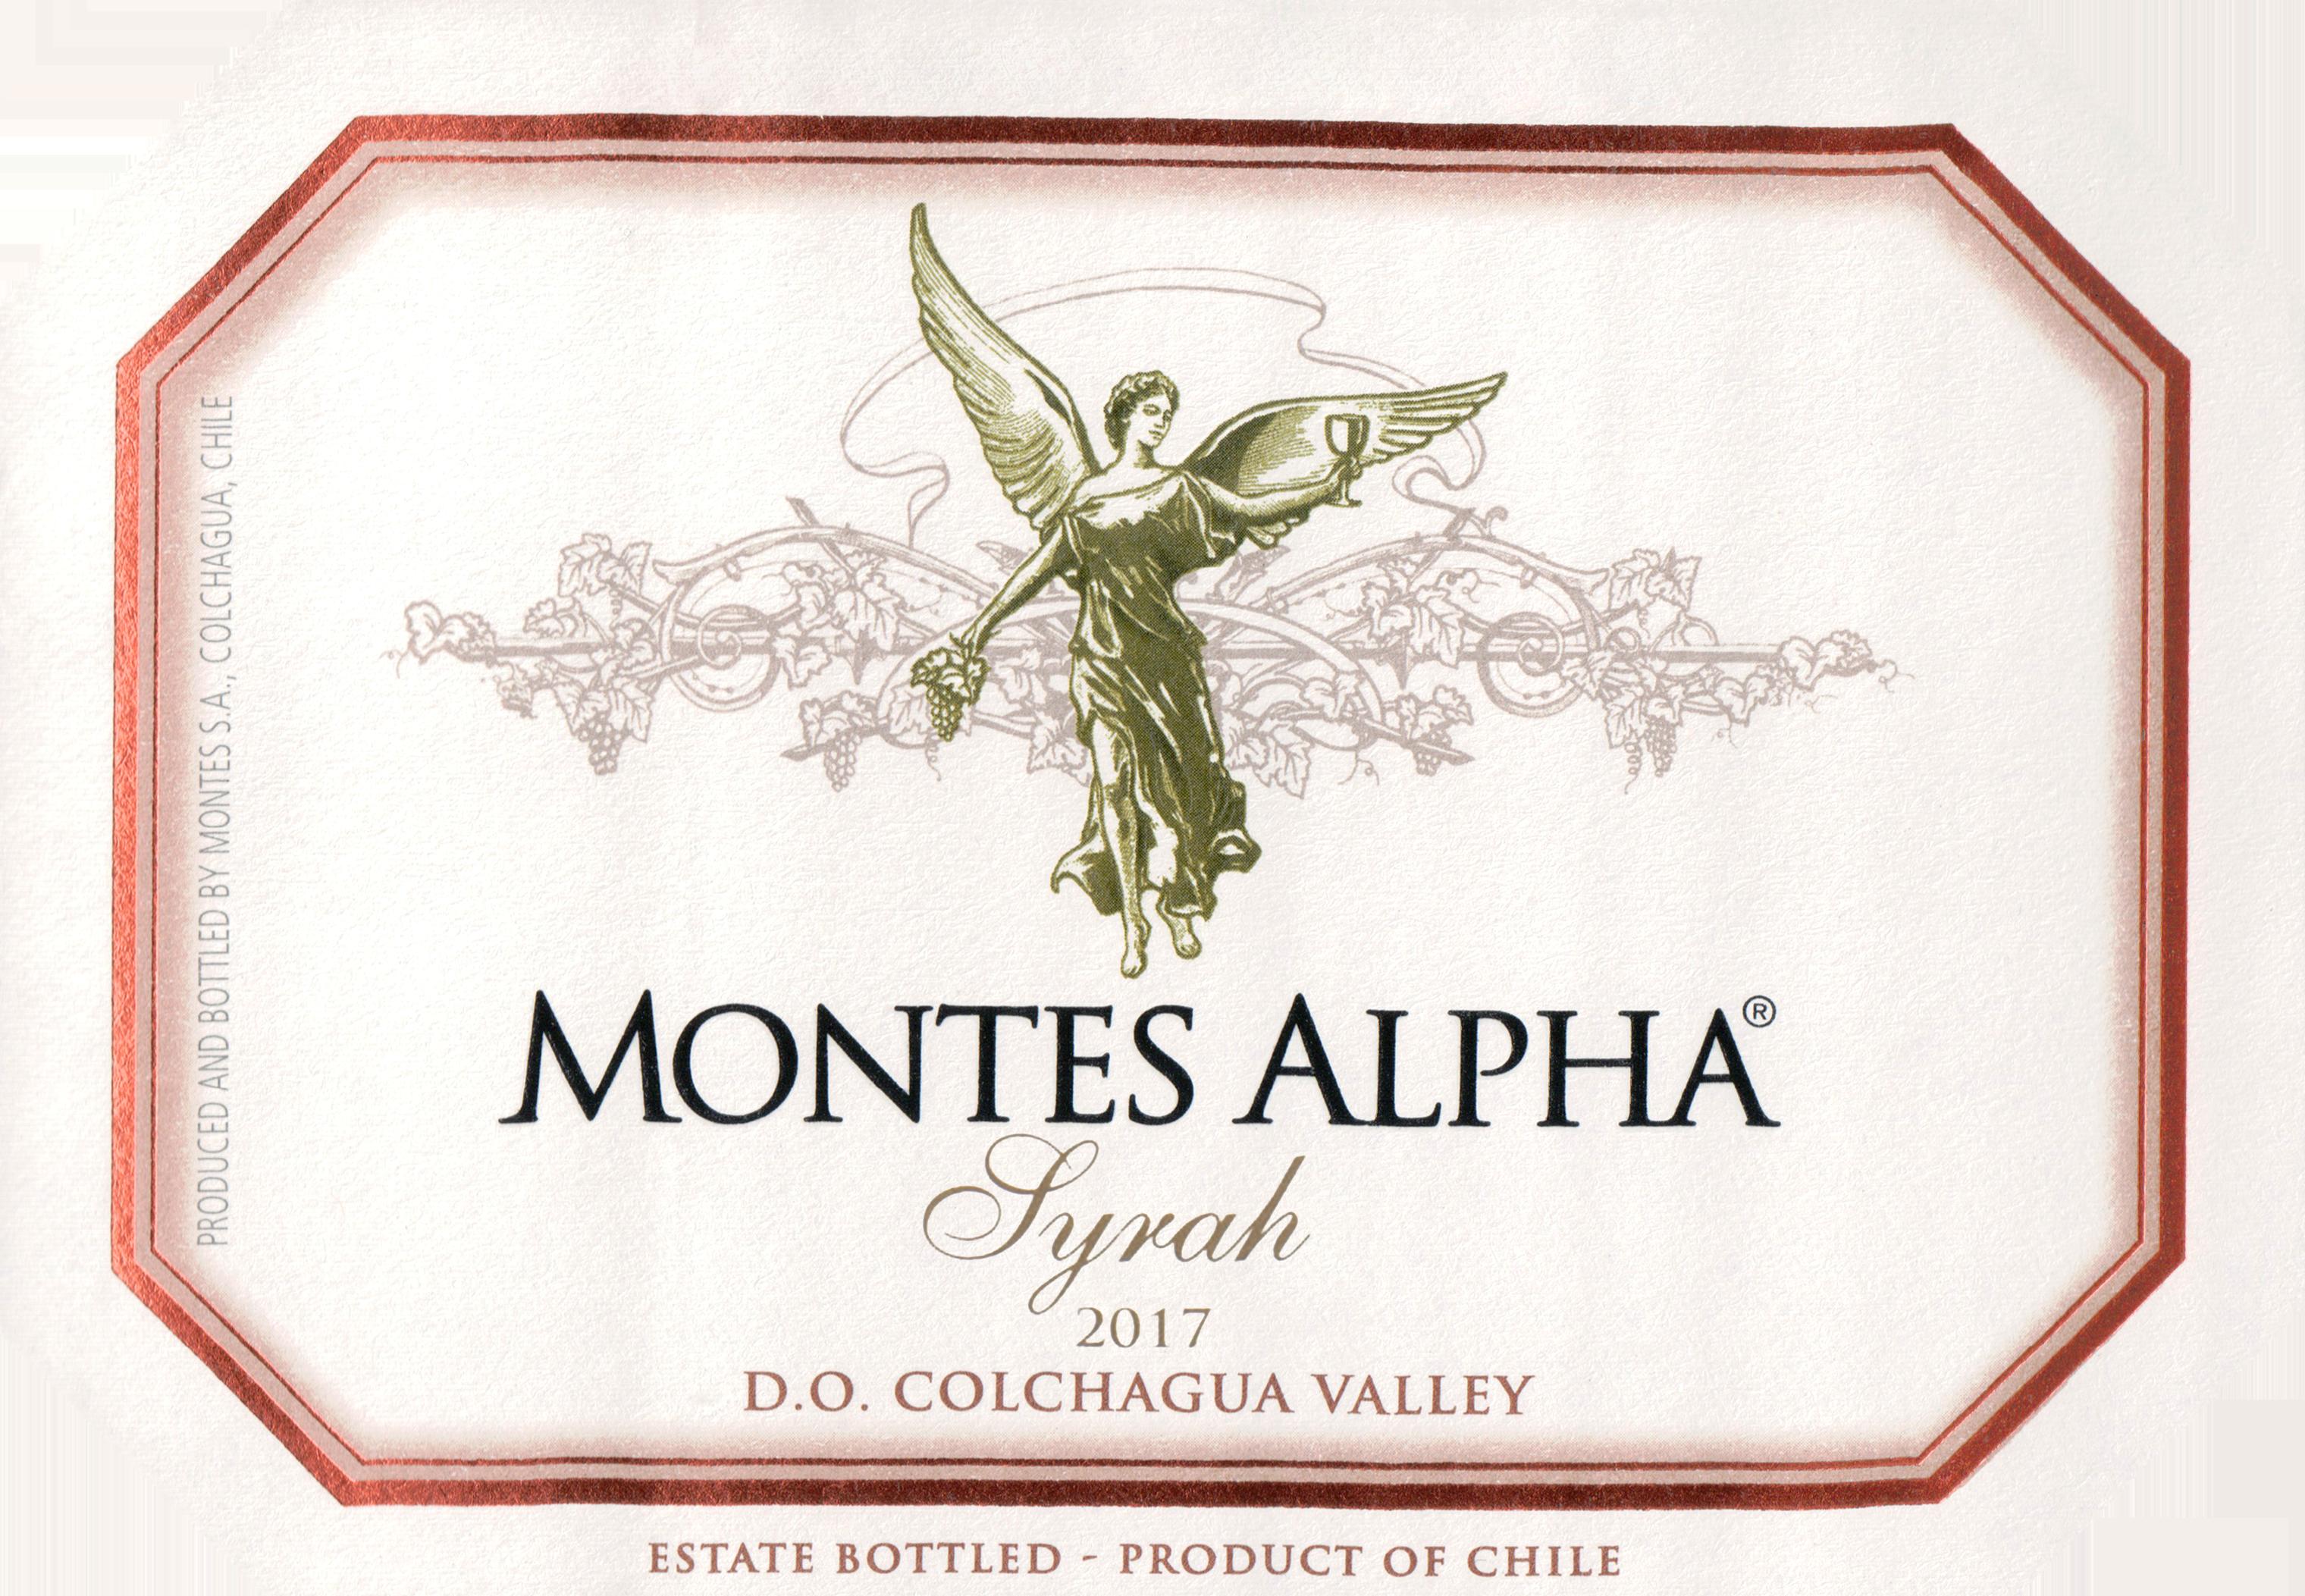 Montes Alpha Syrah 2017